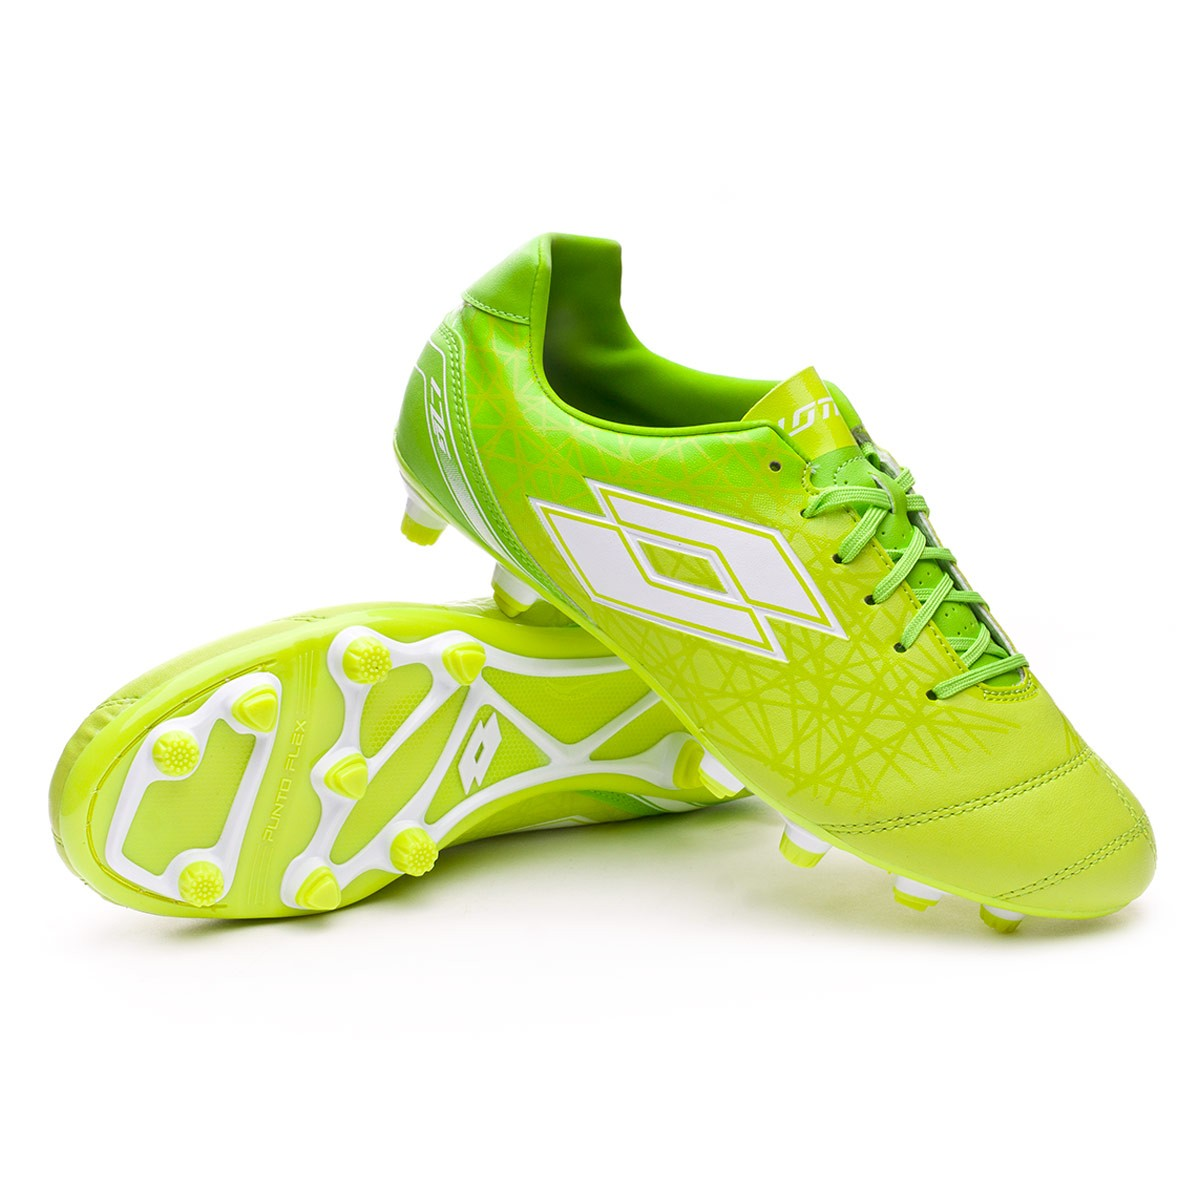 Zapatos de fútbol Lotto Zhero Gravity 700 X FG Green-White ... 4c923429f5916